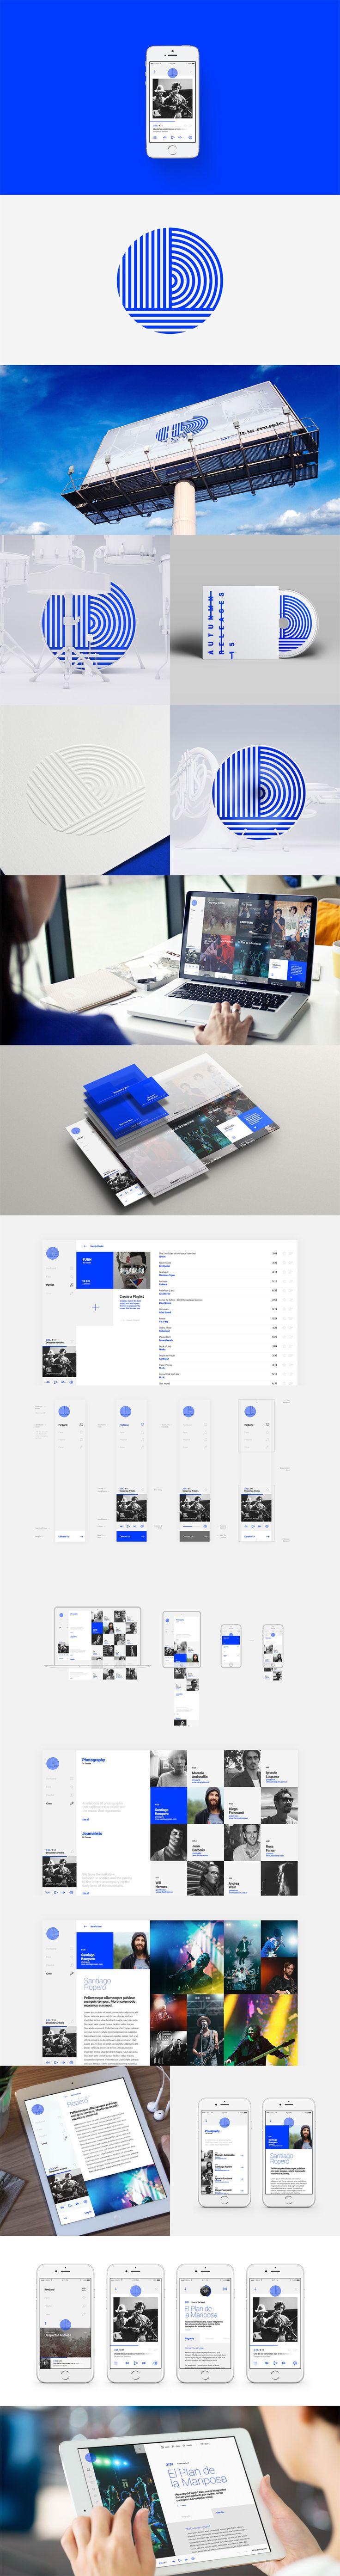 Portband Identity & Platoform by Donhkoland #Design #Platform #InteractionDesign #UI #App #Blue #Branding #Music #MusicReleases #Brand #Band